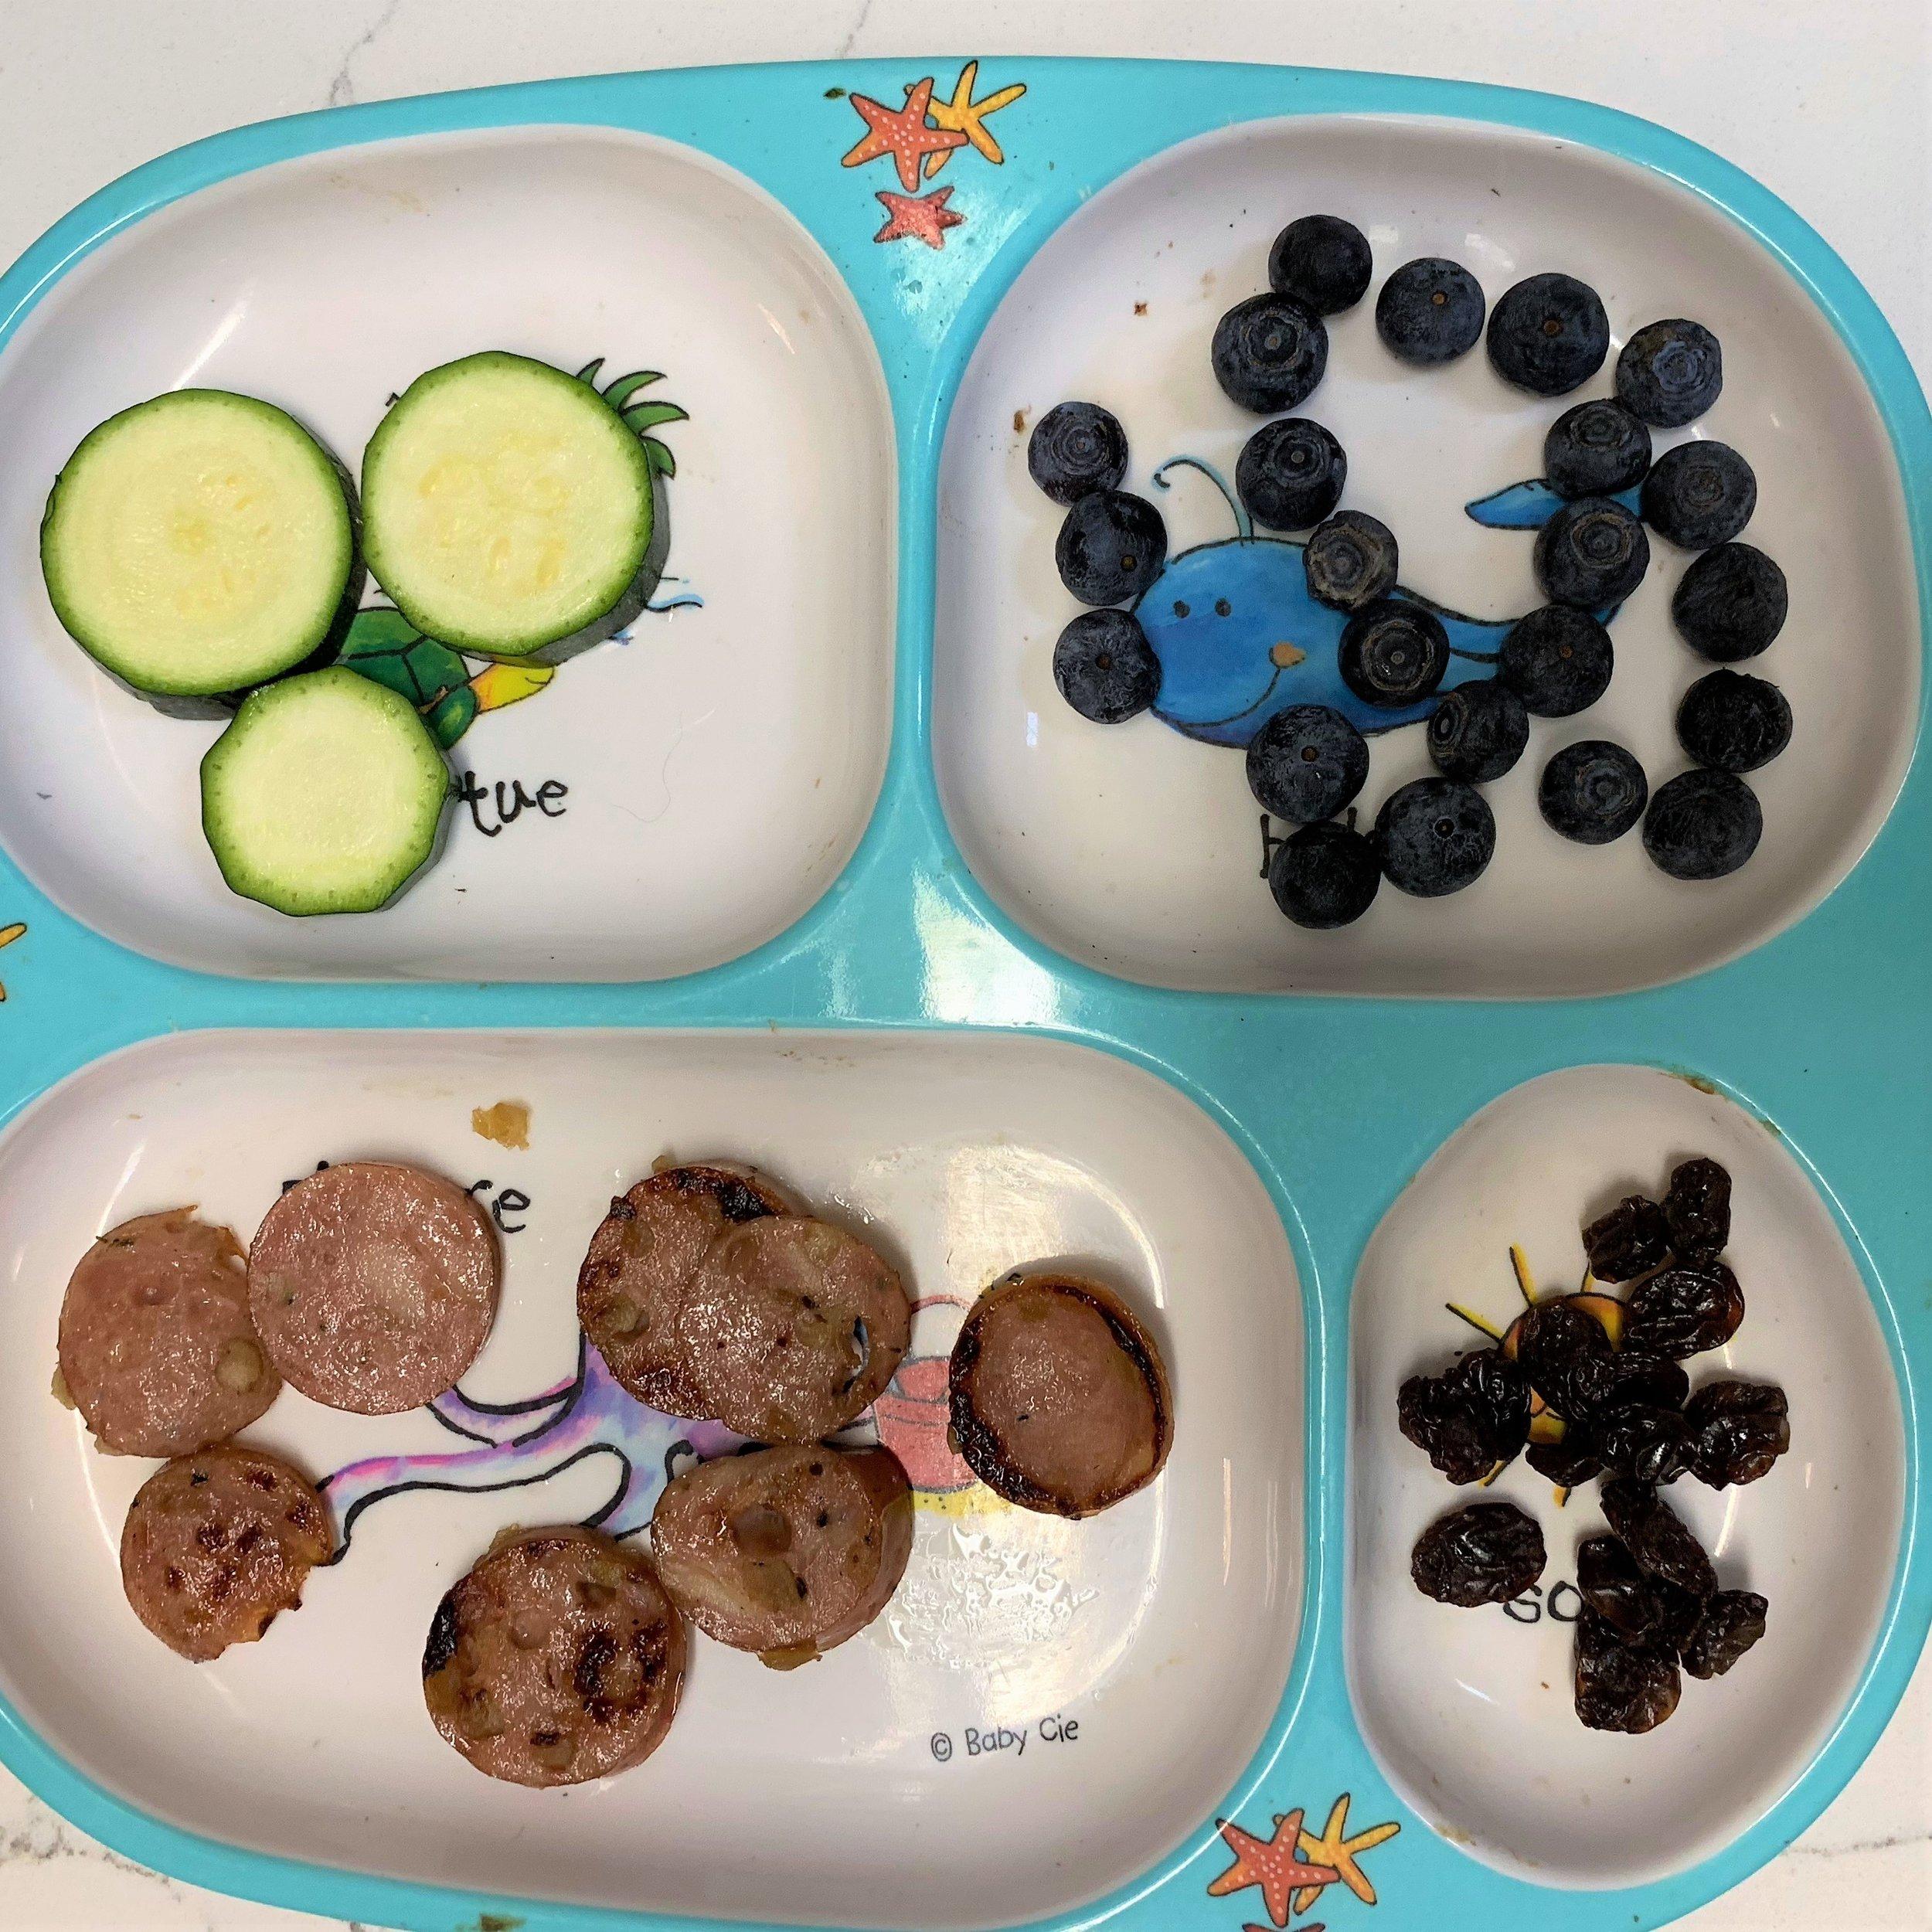 Top left: zucchini   Top right: blueberries  Bottom left: chicken sausage  Bottom right: raisins